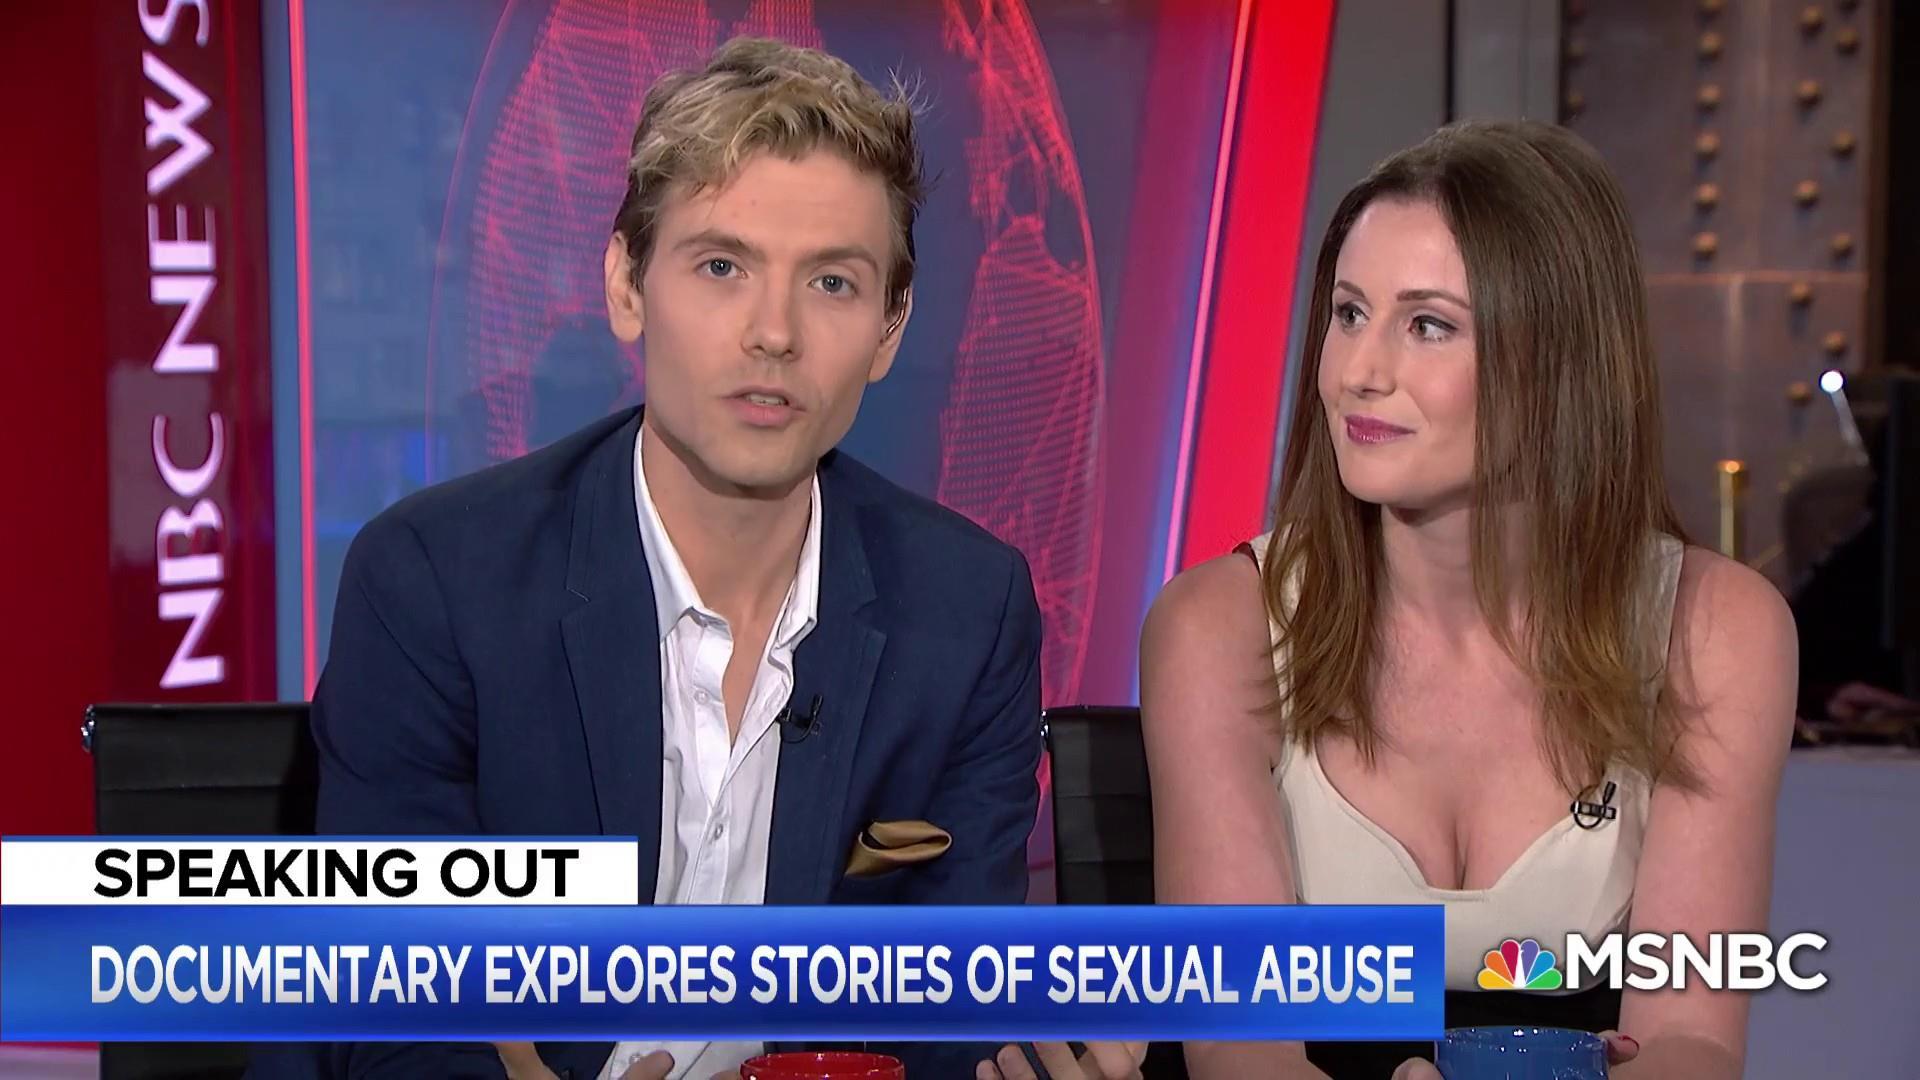 'The Girl Who Cannot Speak' filmmakers, assault survivor speak on #MeToo movement